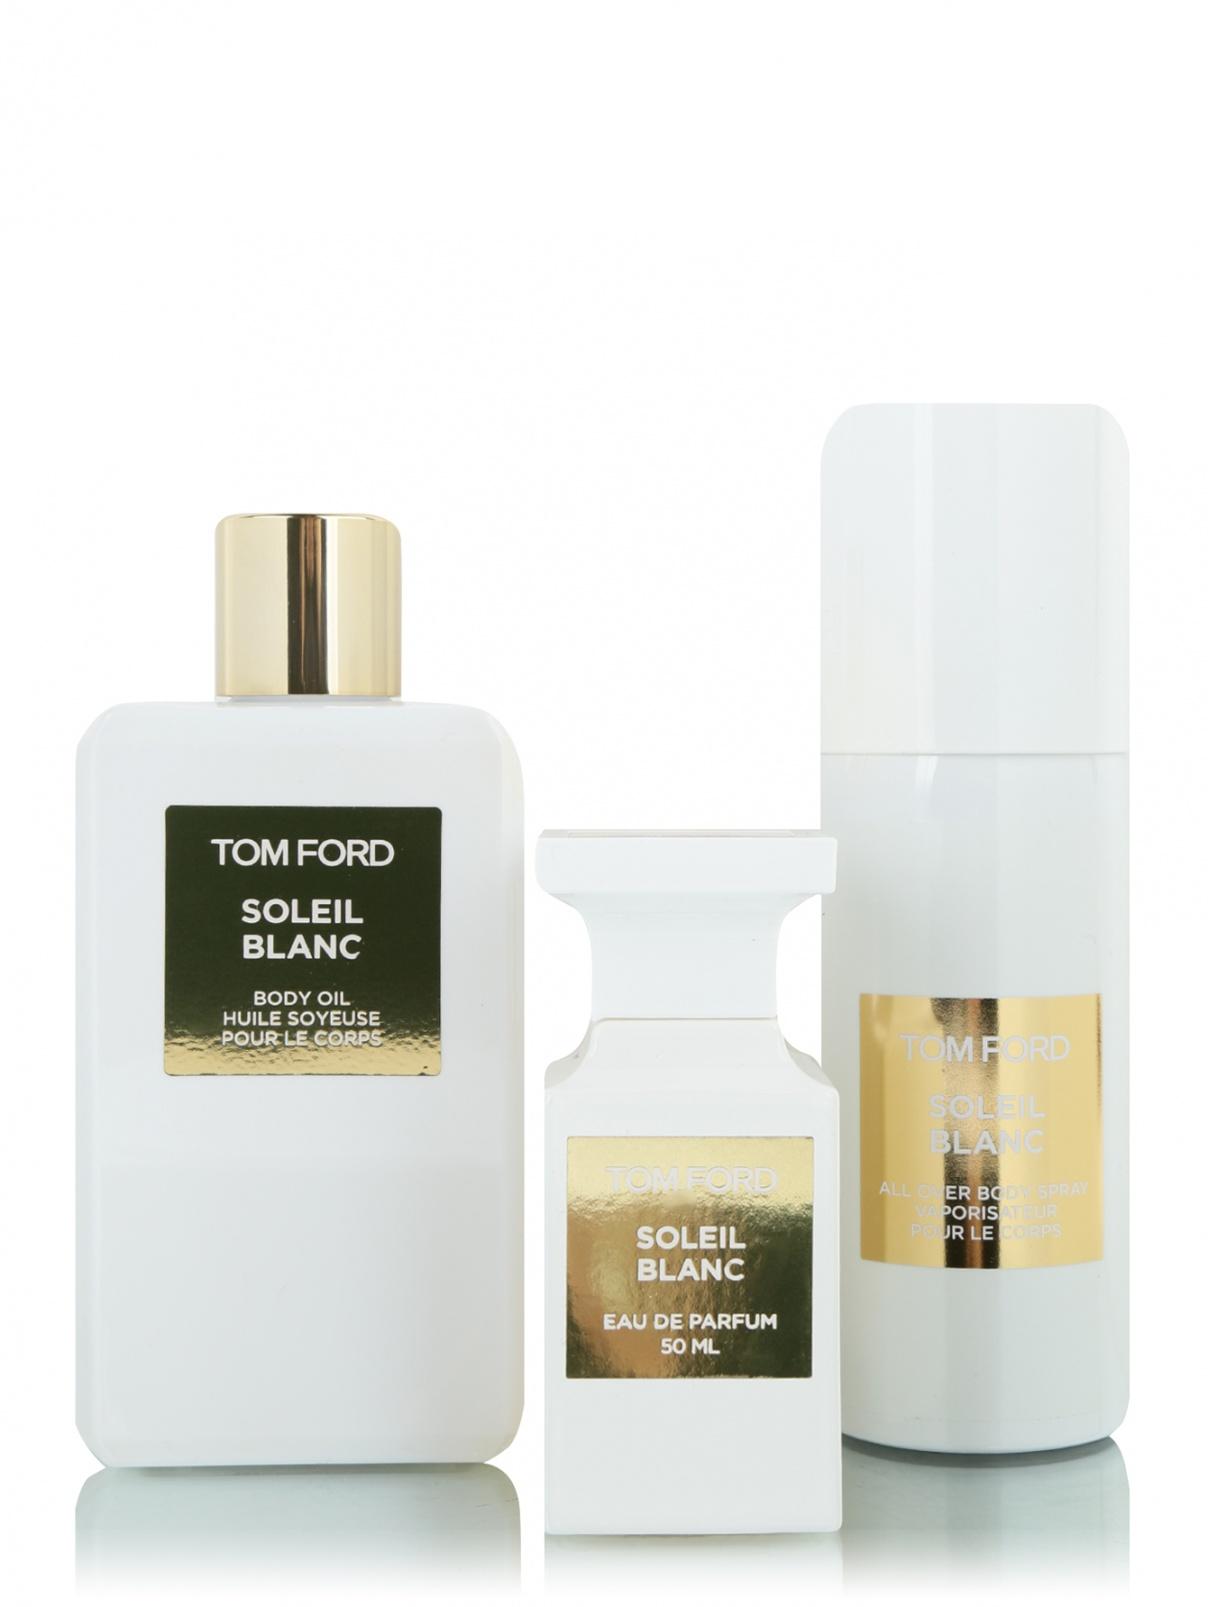 Набор Soleil Blanc (парфюмерная вода 50 мл, масло для тела 250 мл, спрей для тела 150 мл) Tom Ford  –  Общий вид